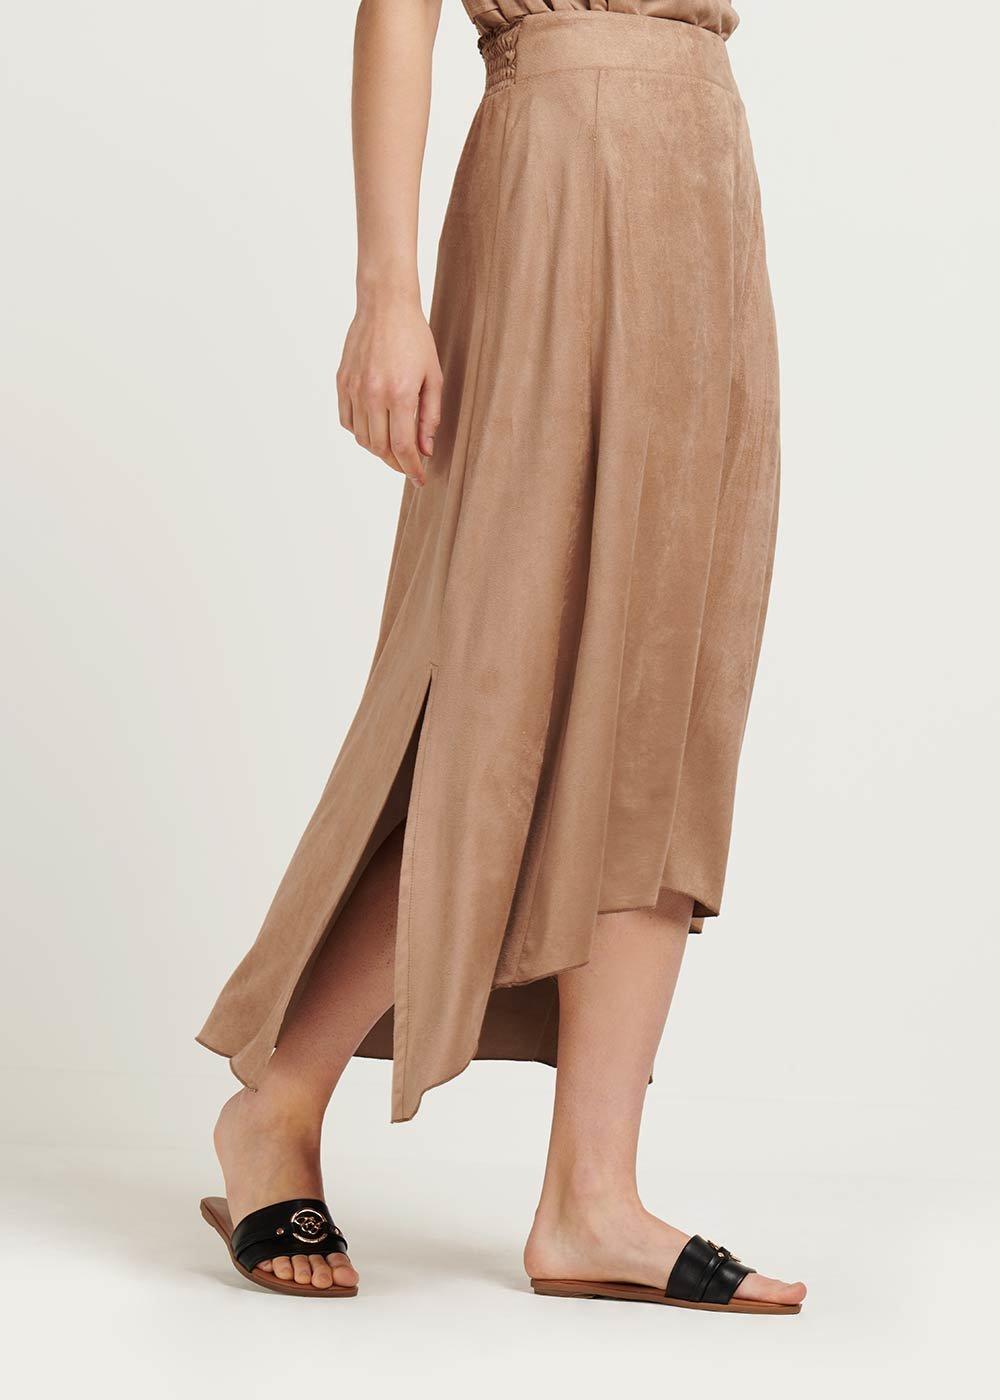 Gabi faux-suede skirt with alcantara effect - Pecan - Woman